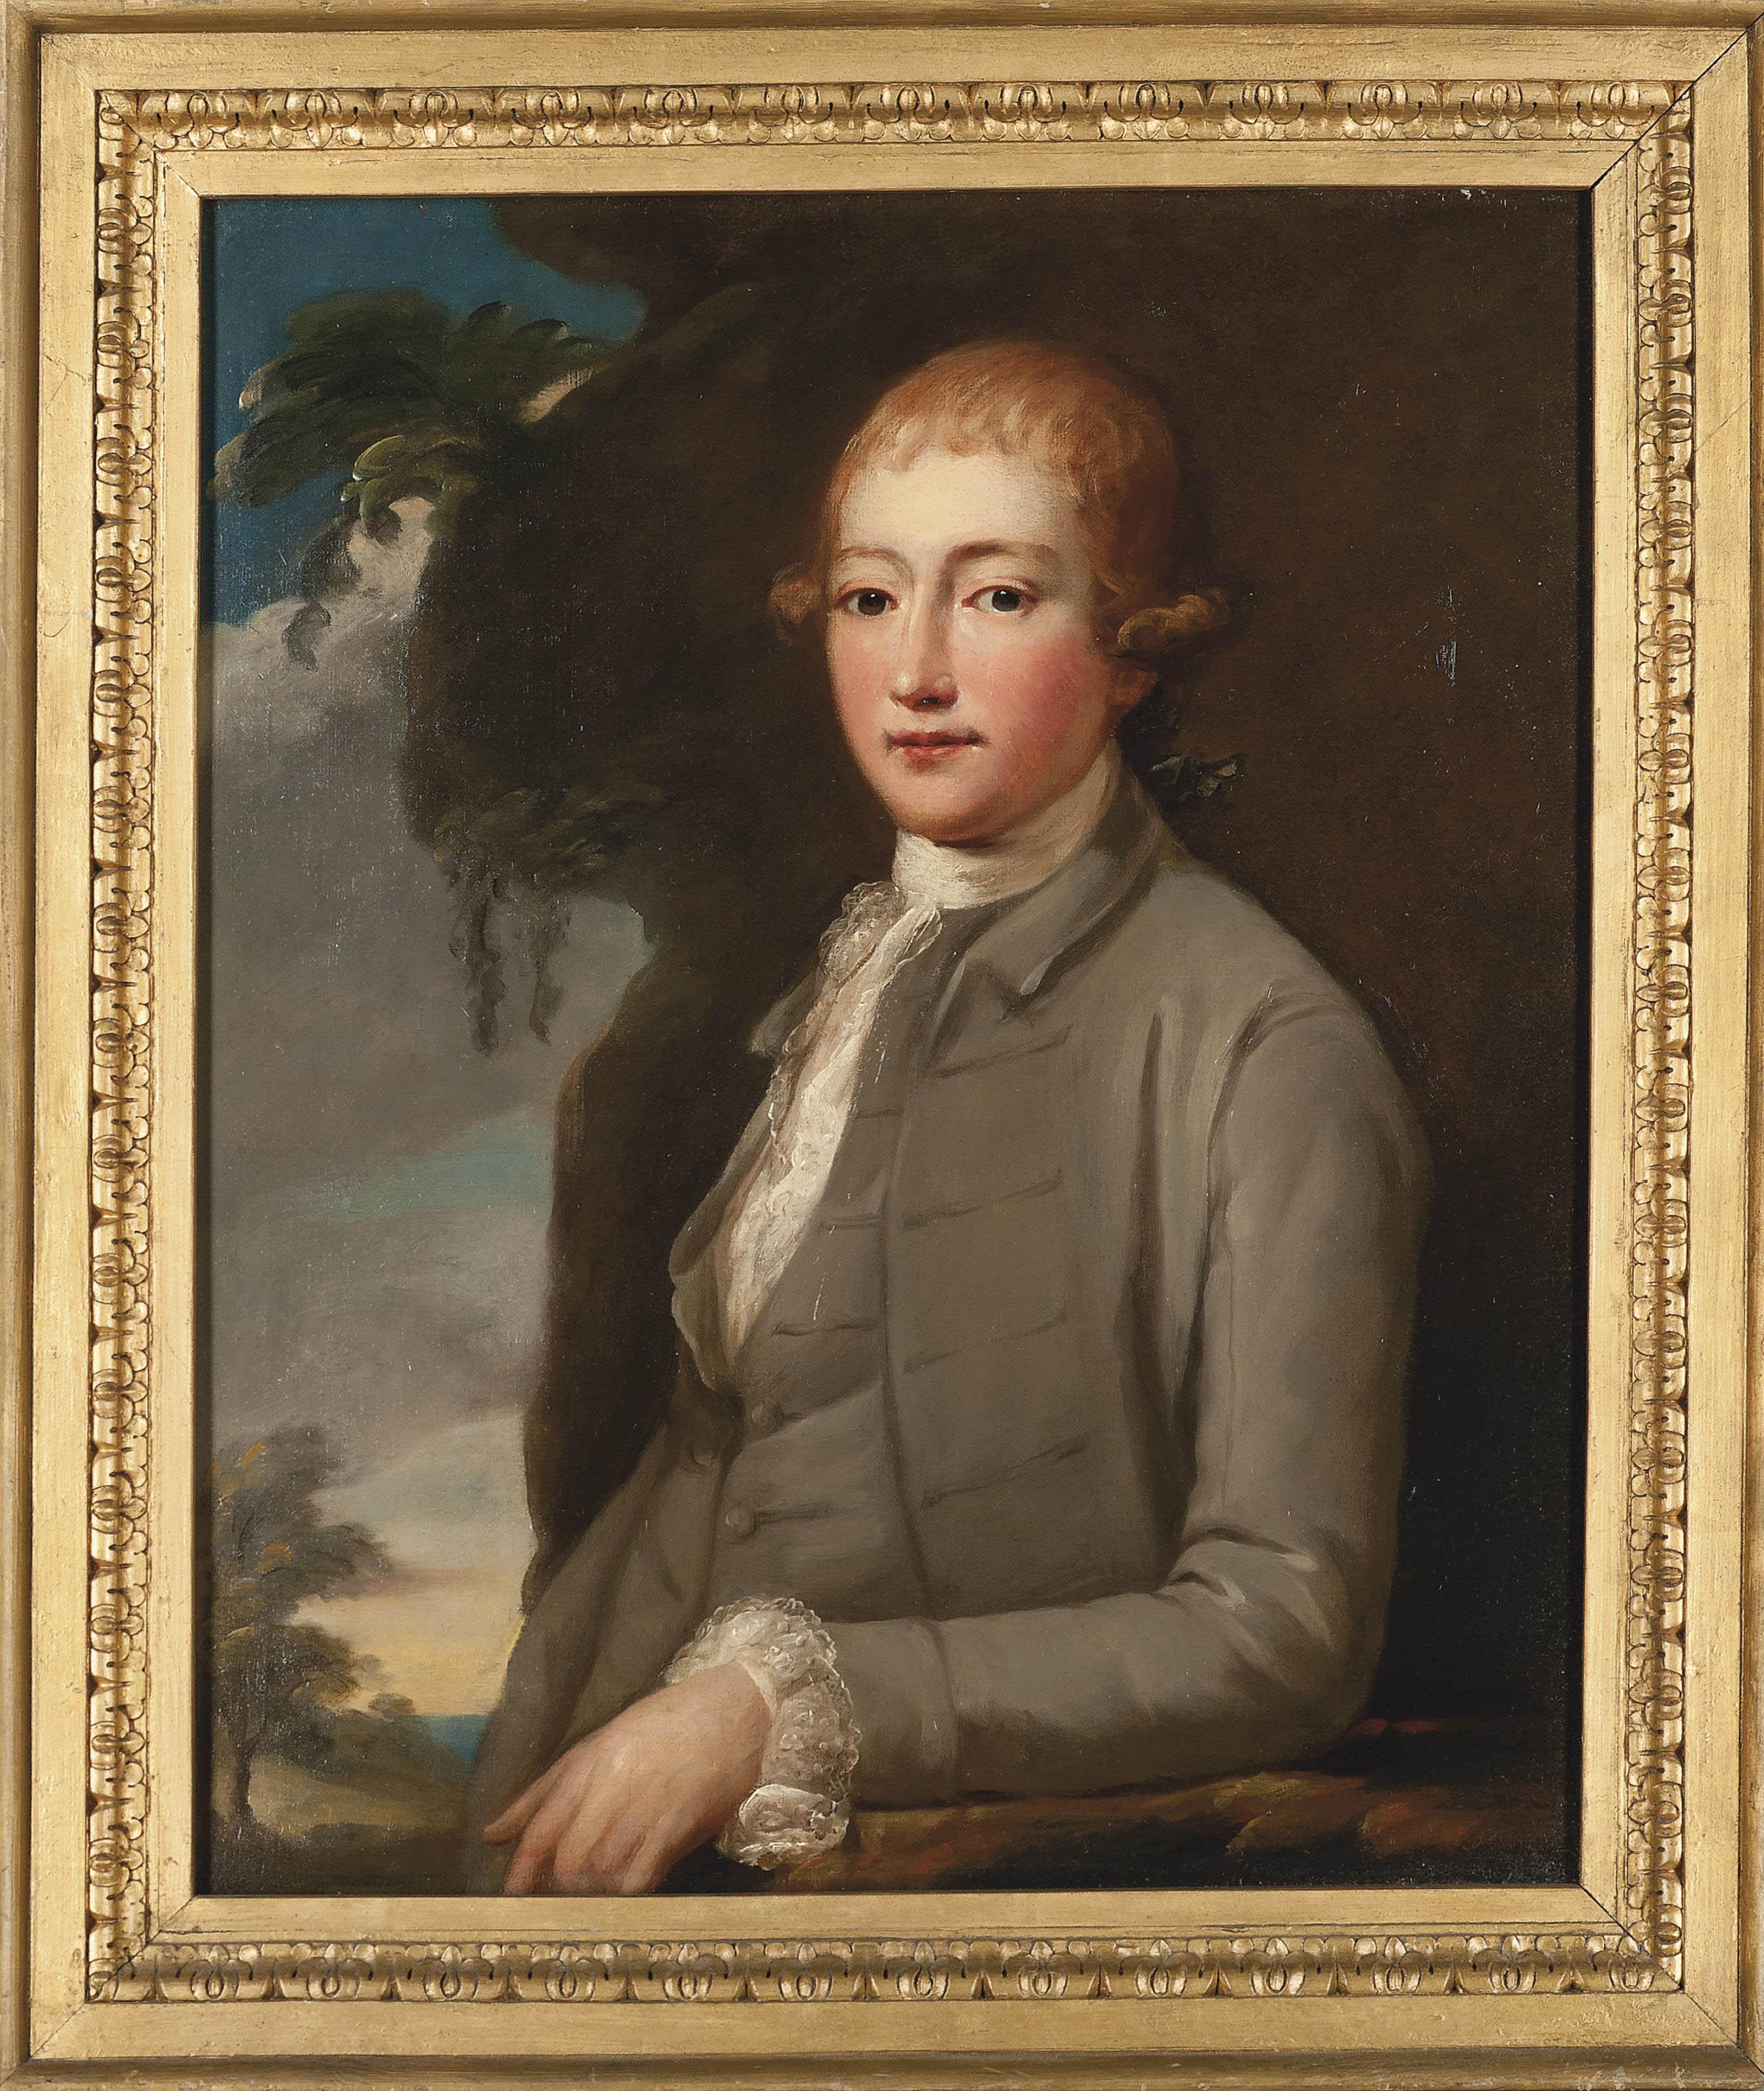 Follower of Joseph Wright of D